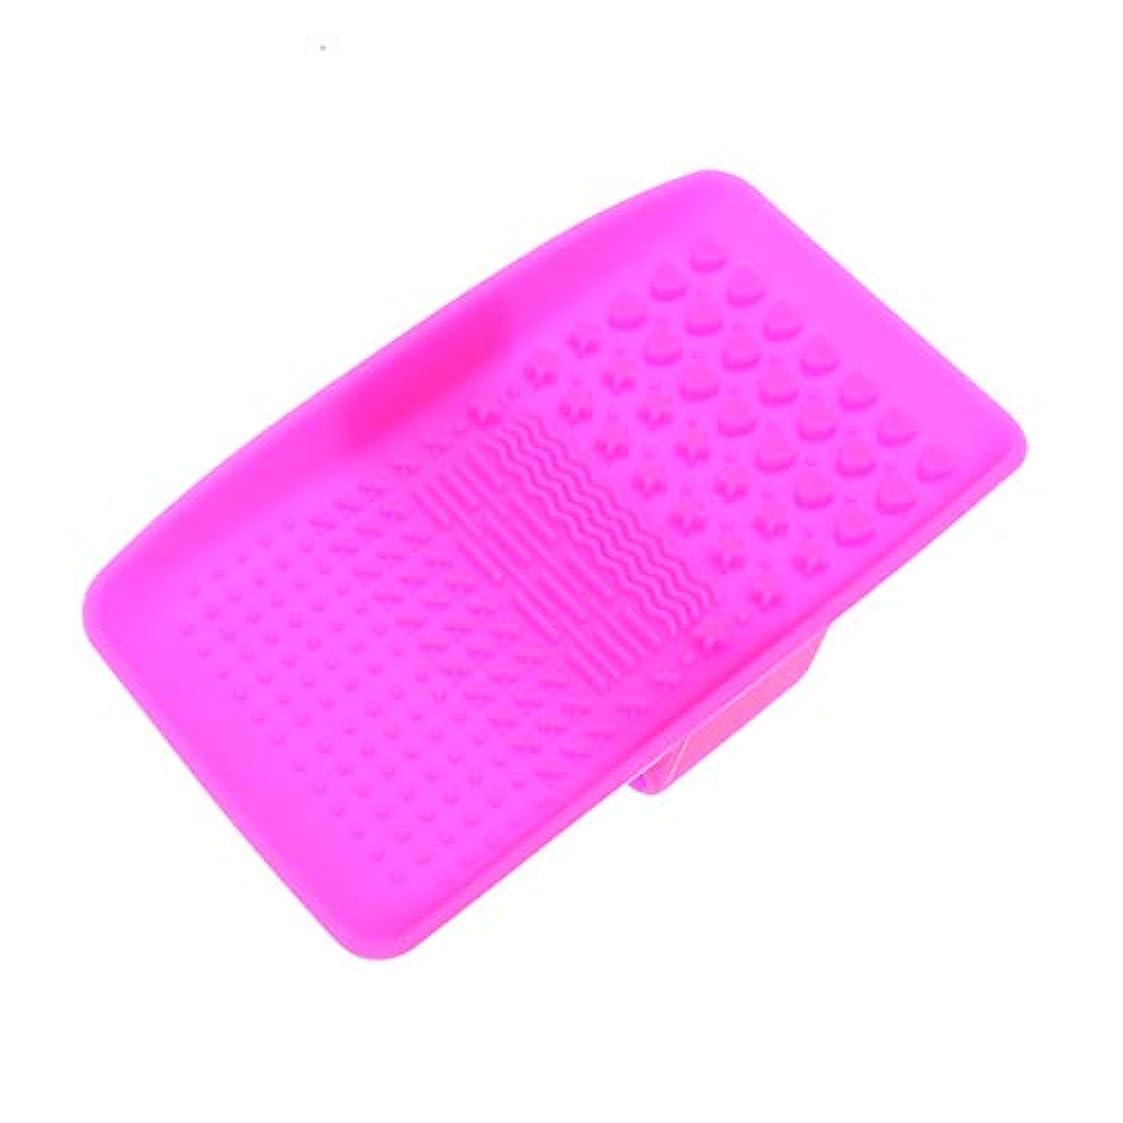 Beaupretty 吸引ブラシが付いているシリコーンのブラシのクリーニングのマットの携帯用化粧品のブラシの洗剤